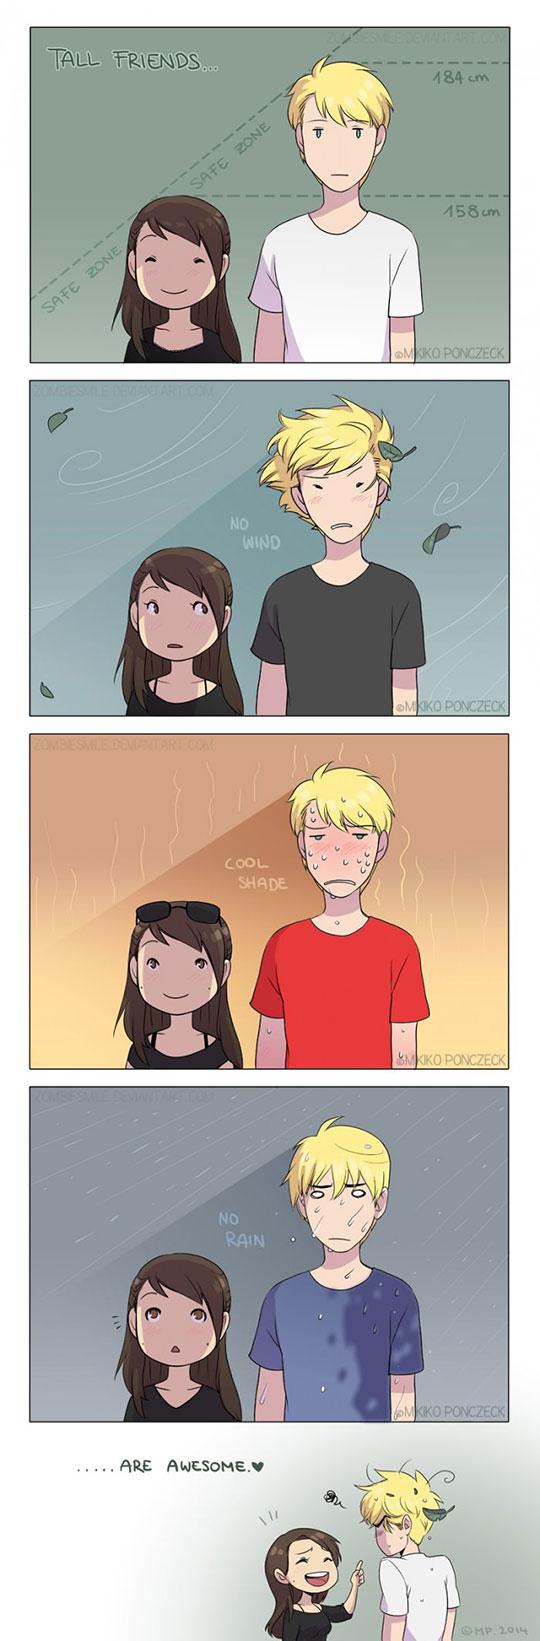 cute-webcomic-tall-friend-girl